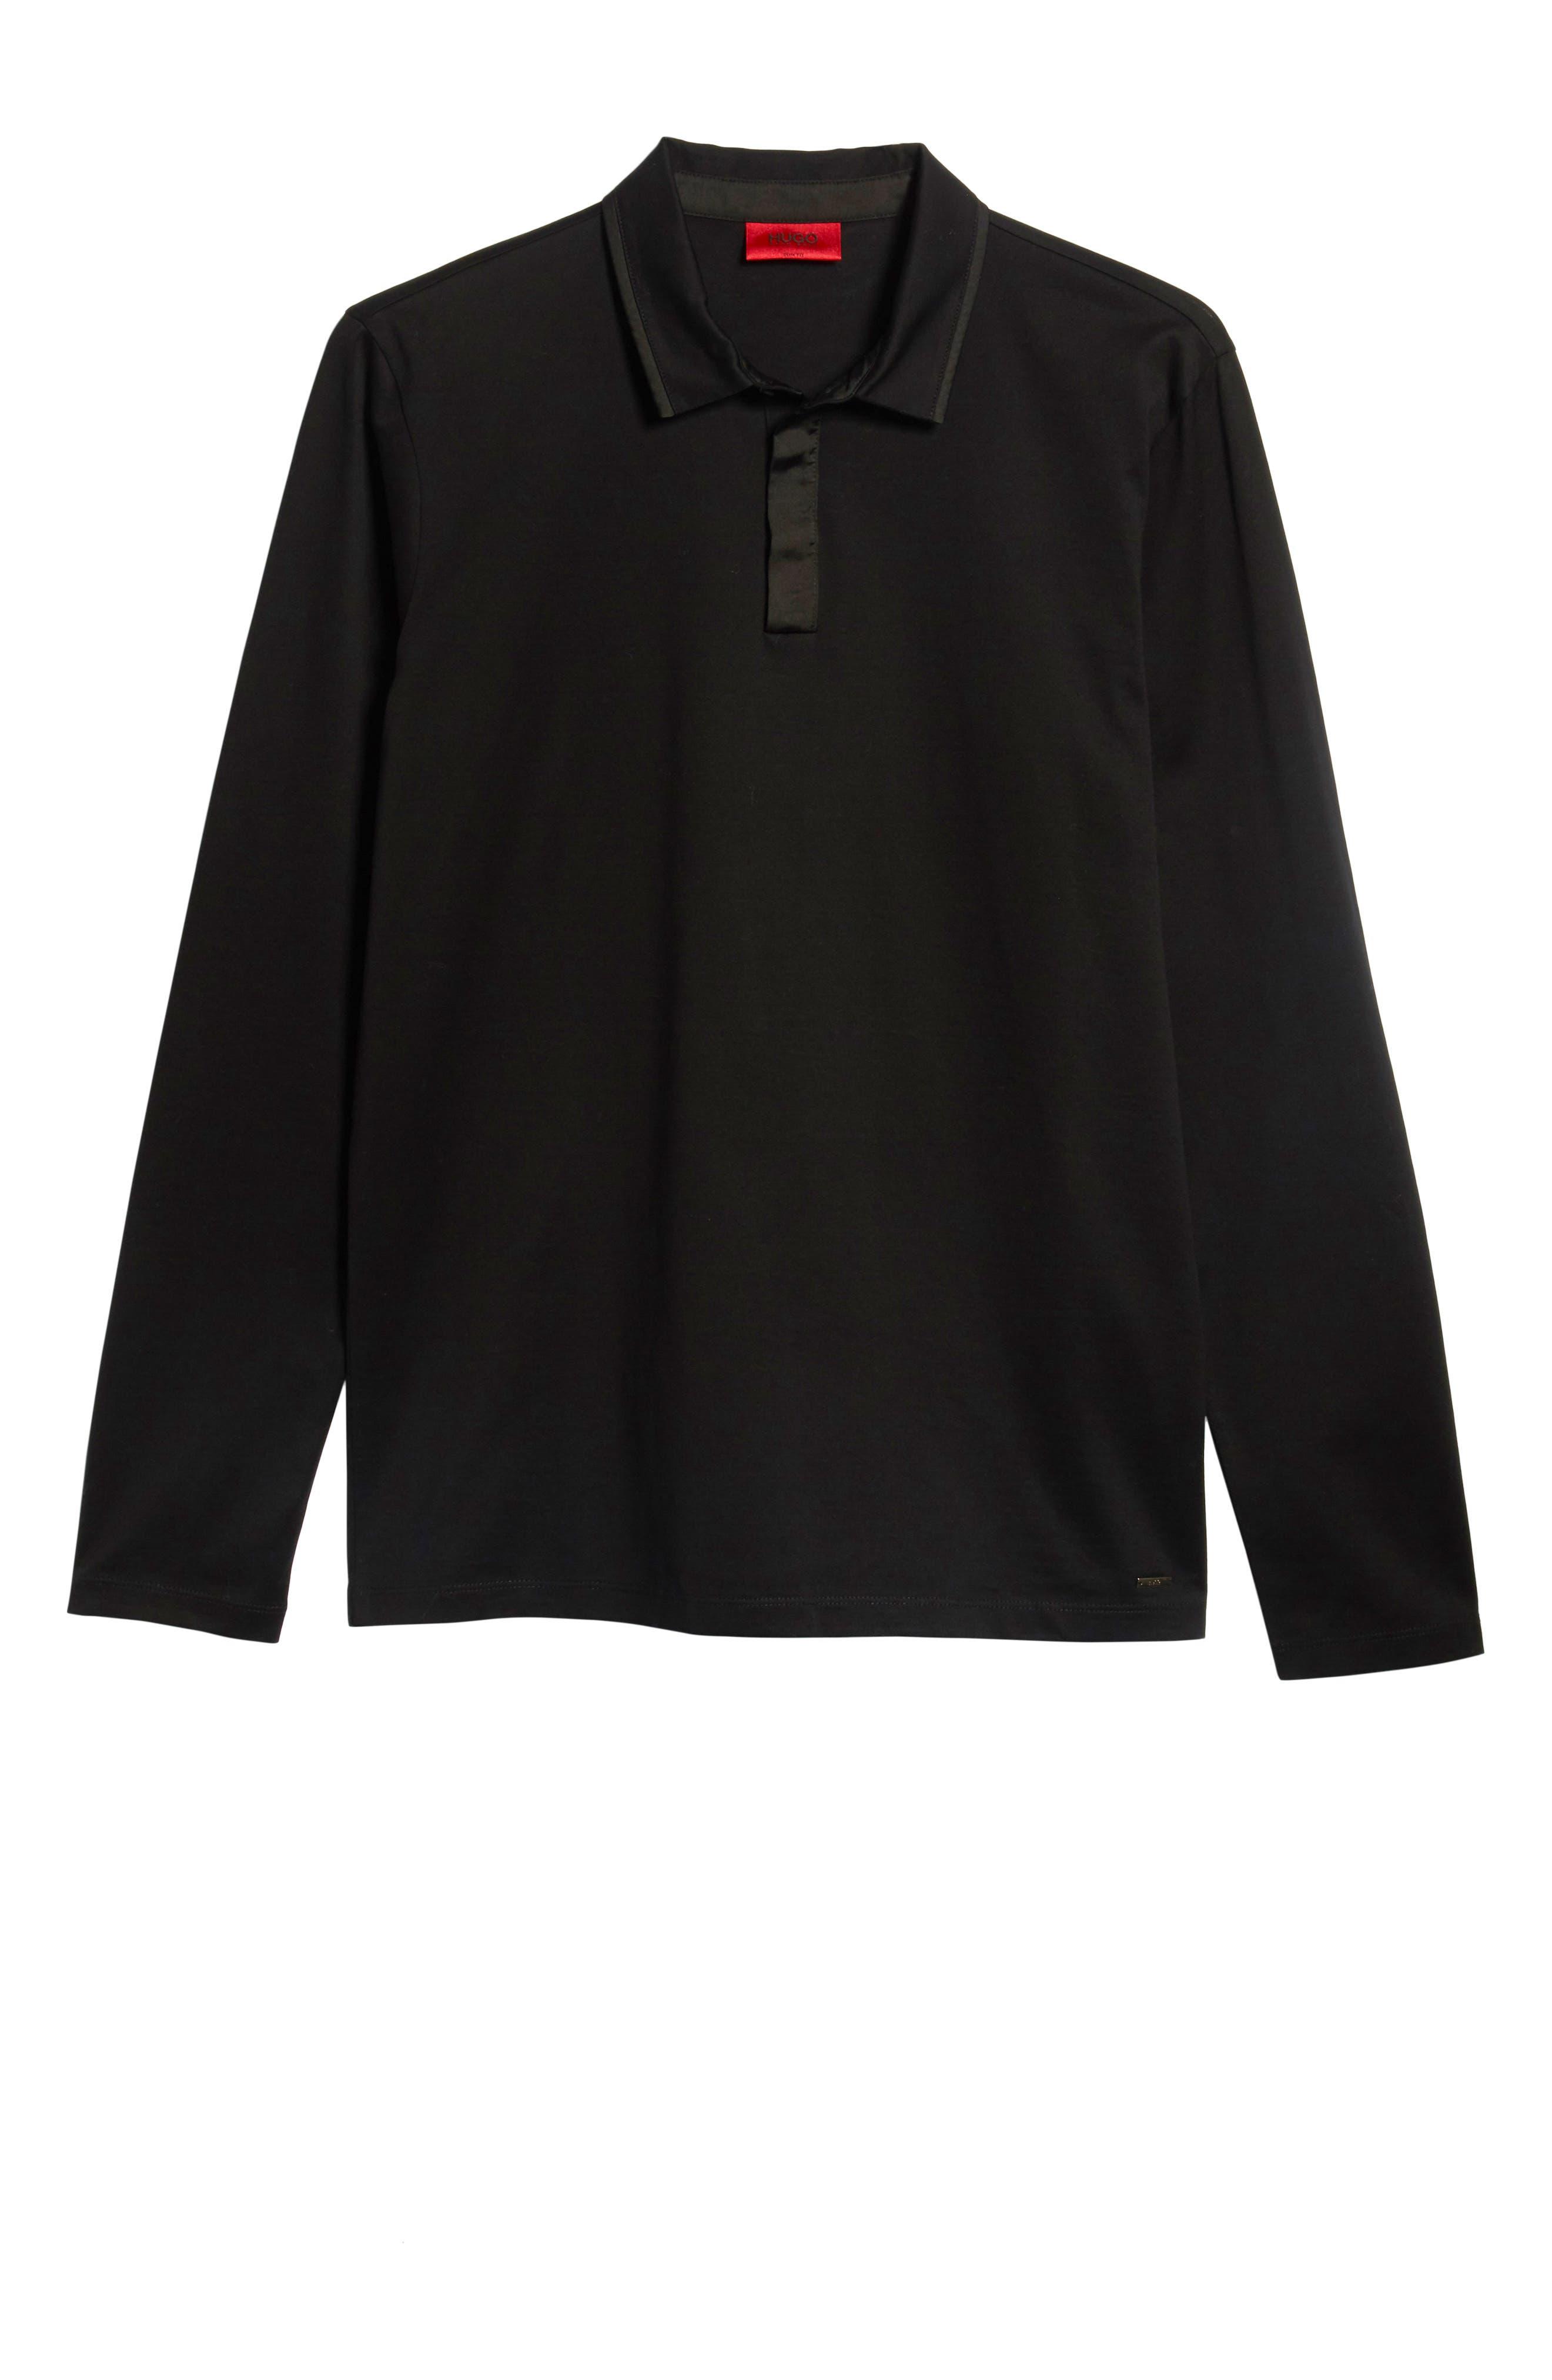 Dalendar Mercerized Cotton Slim Fit Polo Shirt,                             Alternate thumbnail 6, color,                             BLACK